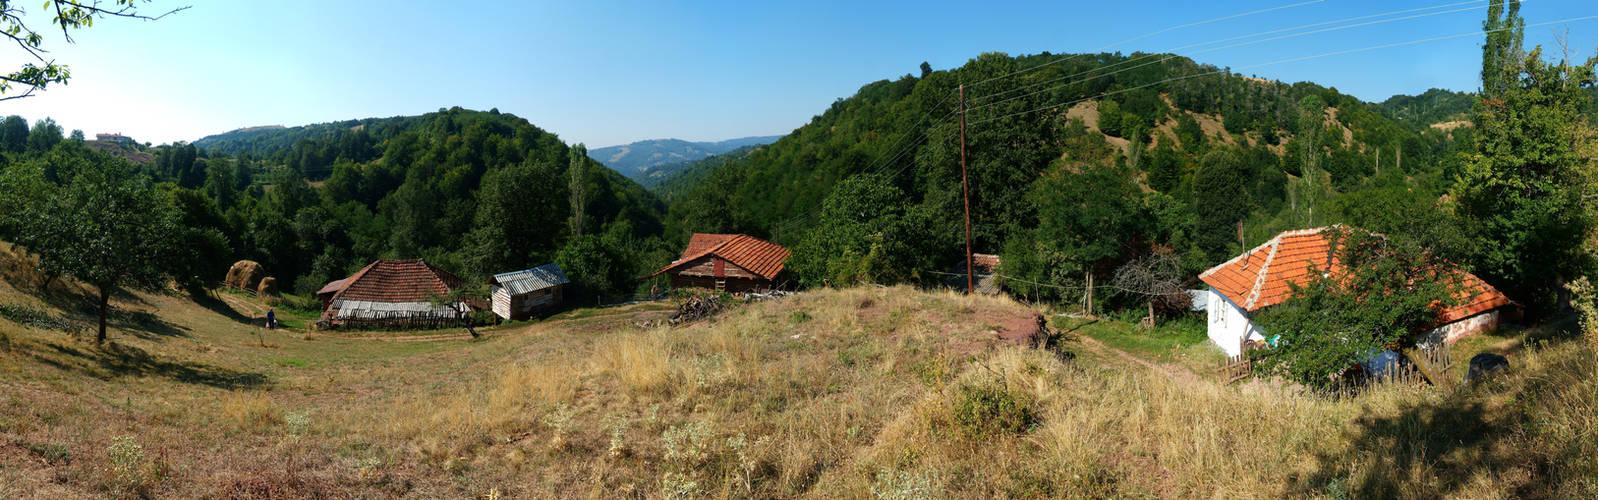 SW in Macedonia: Summertime